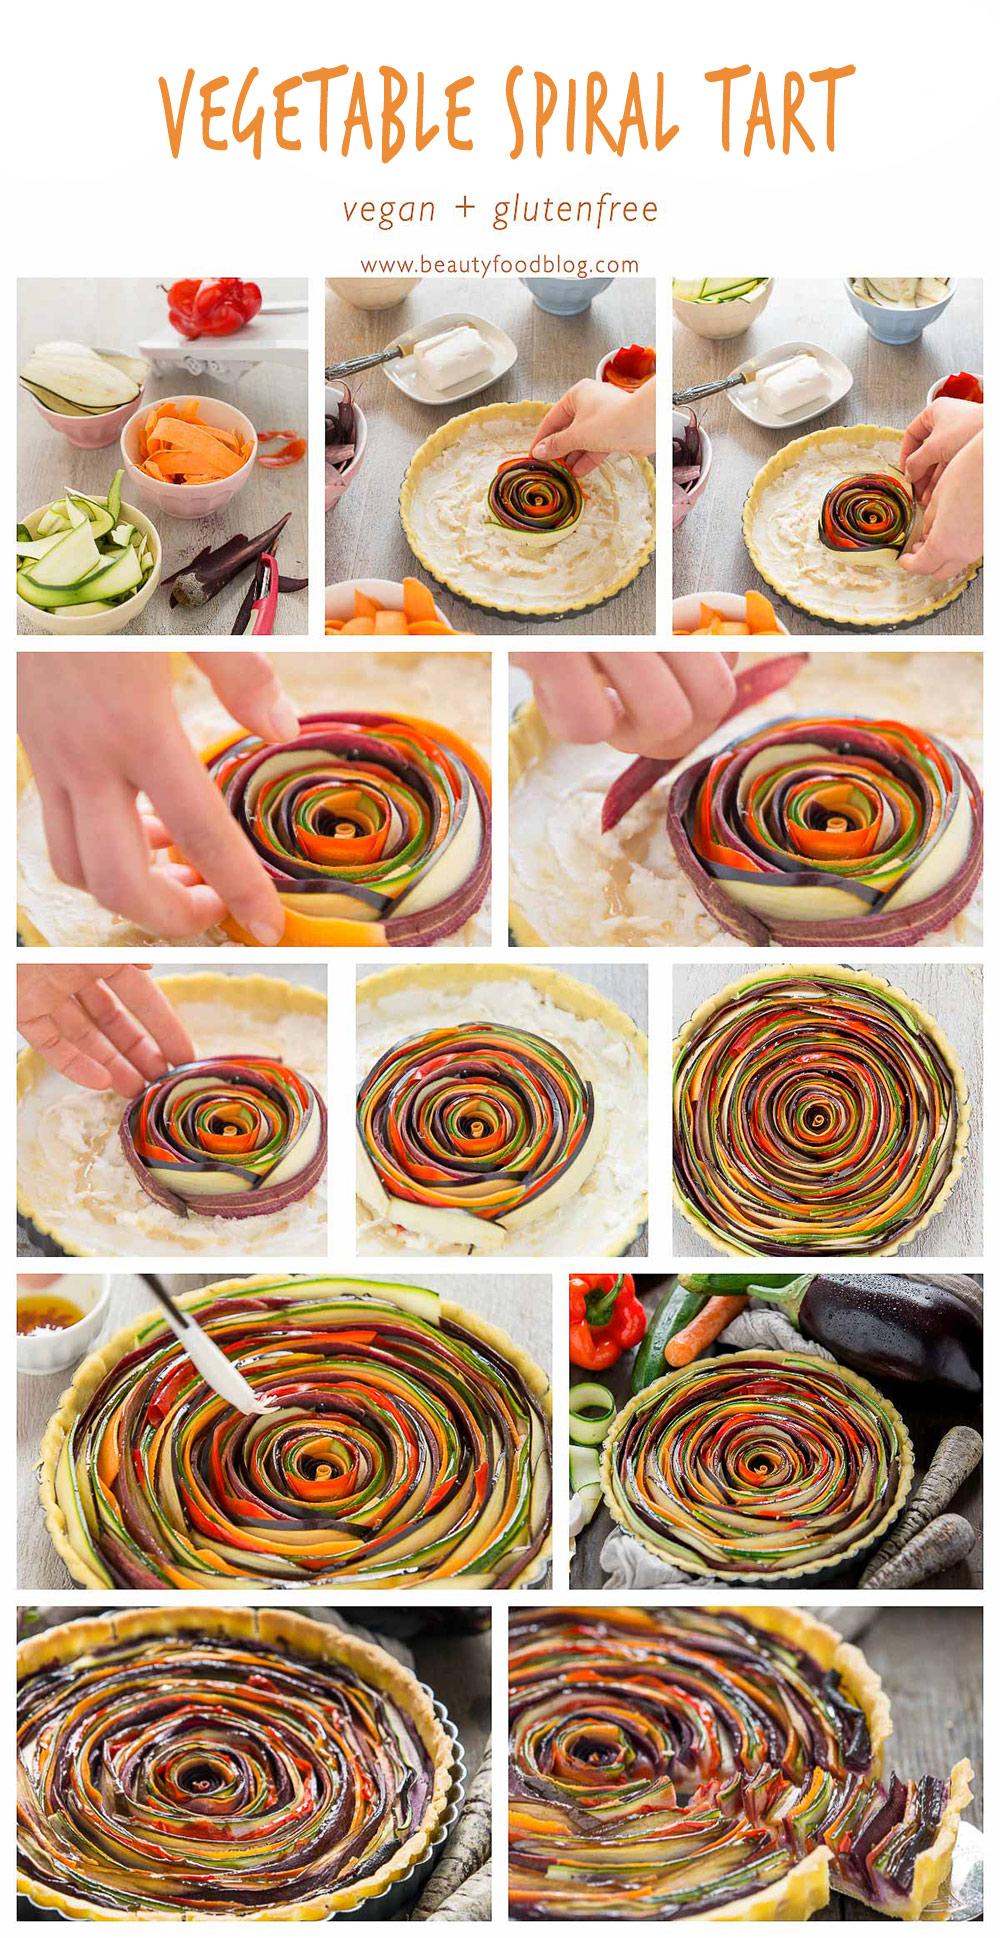 vegan #glutenfree VEGETABLE SPIRAL TART step by step. | torta salata di verdure a spirale #senzaglutine senza uova senza burro #vegan ricetta